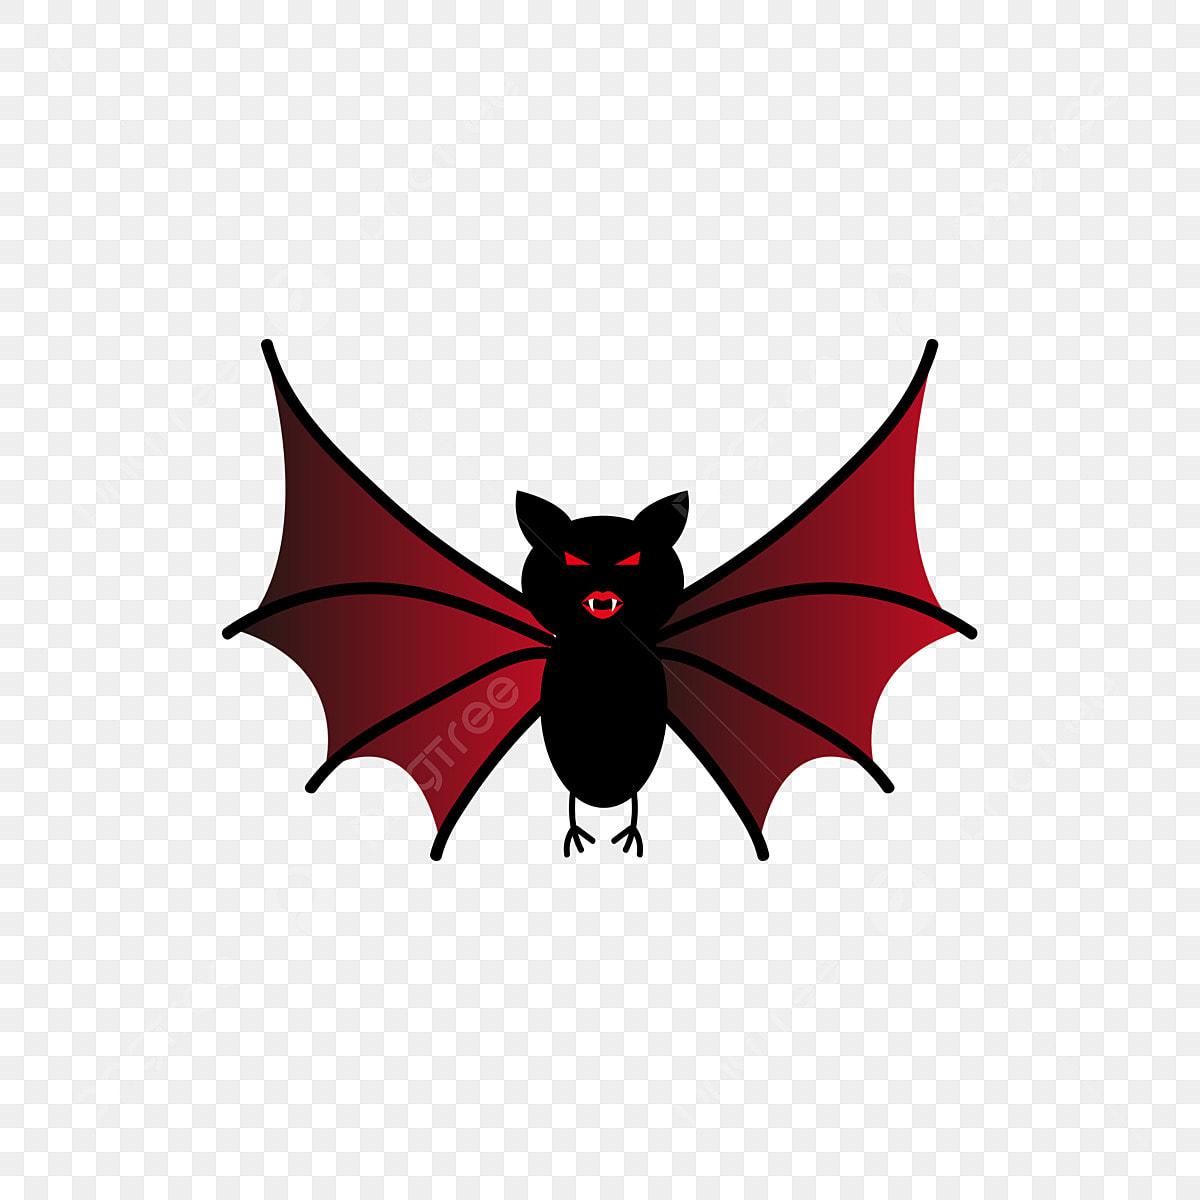 Halloween Horror Blood Red Bats Commercial Elements, Bat